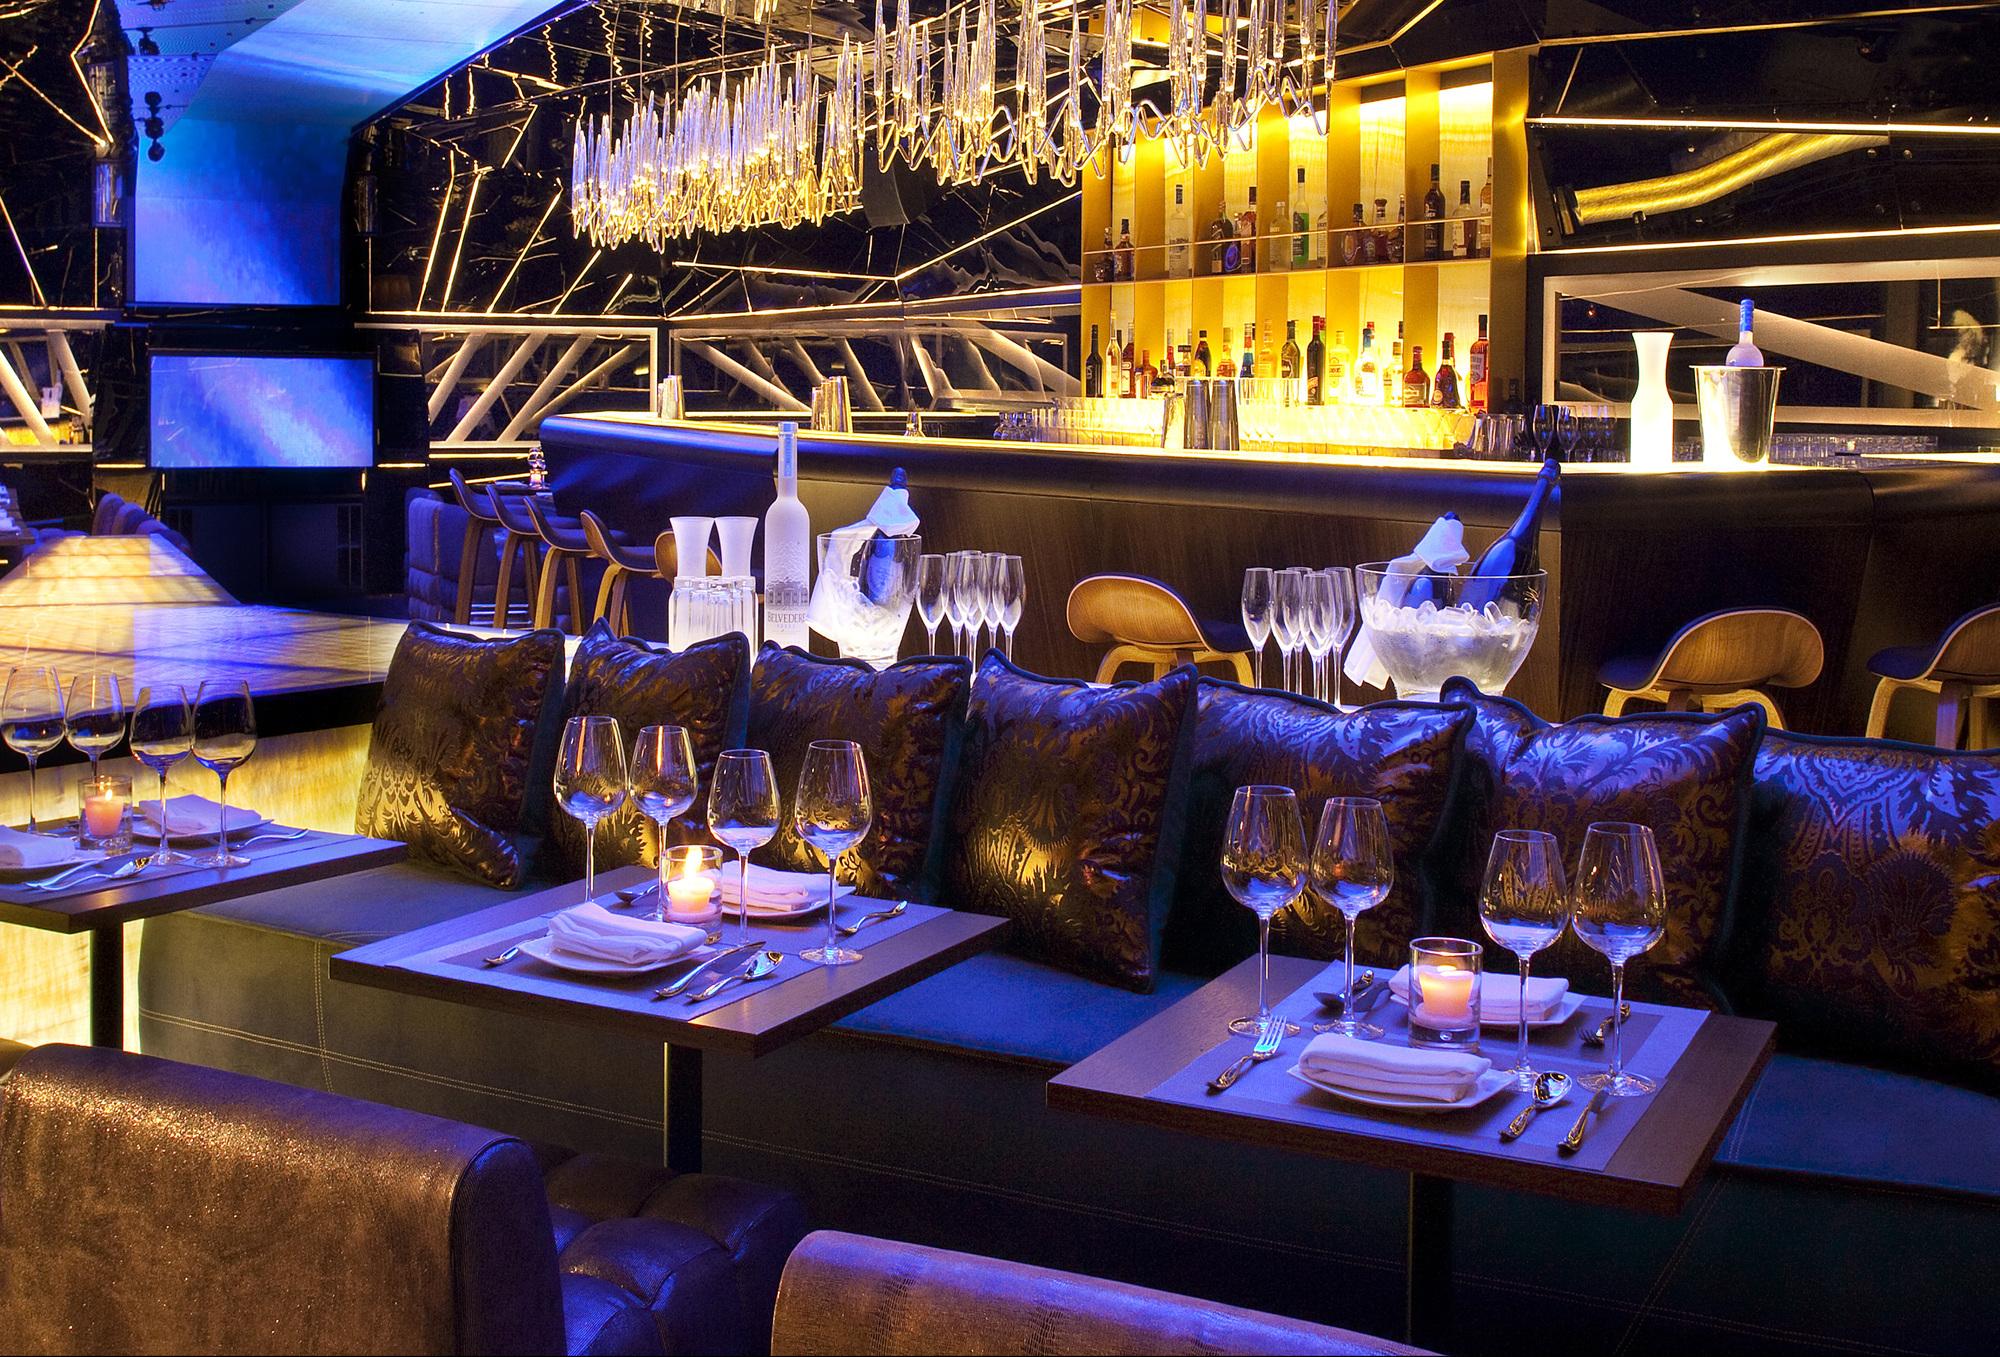 Интерьер ресторана Alegra в центре Дубая